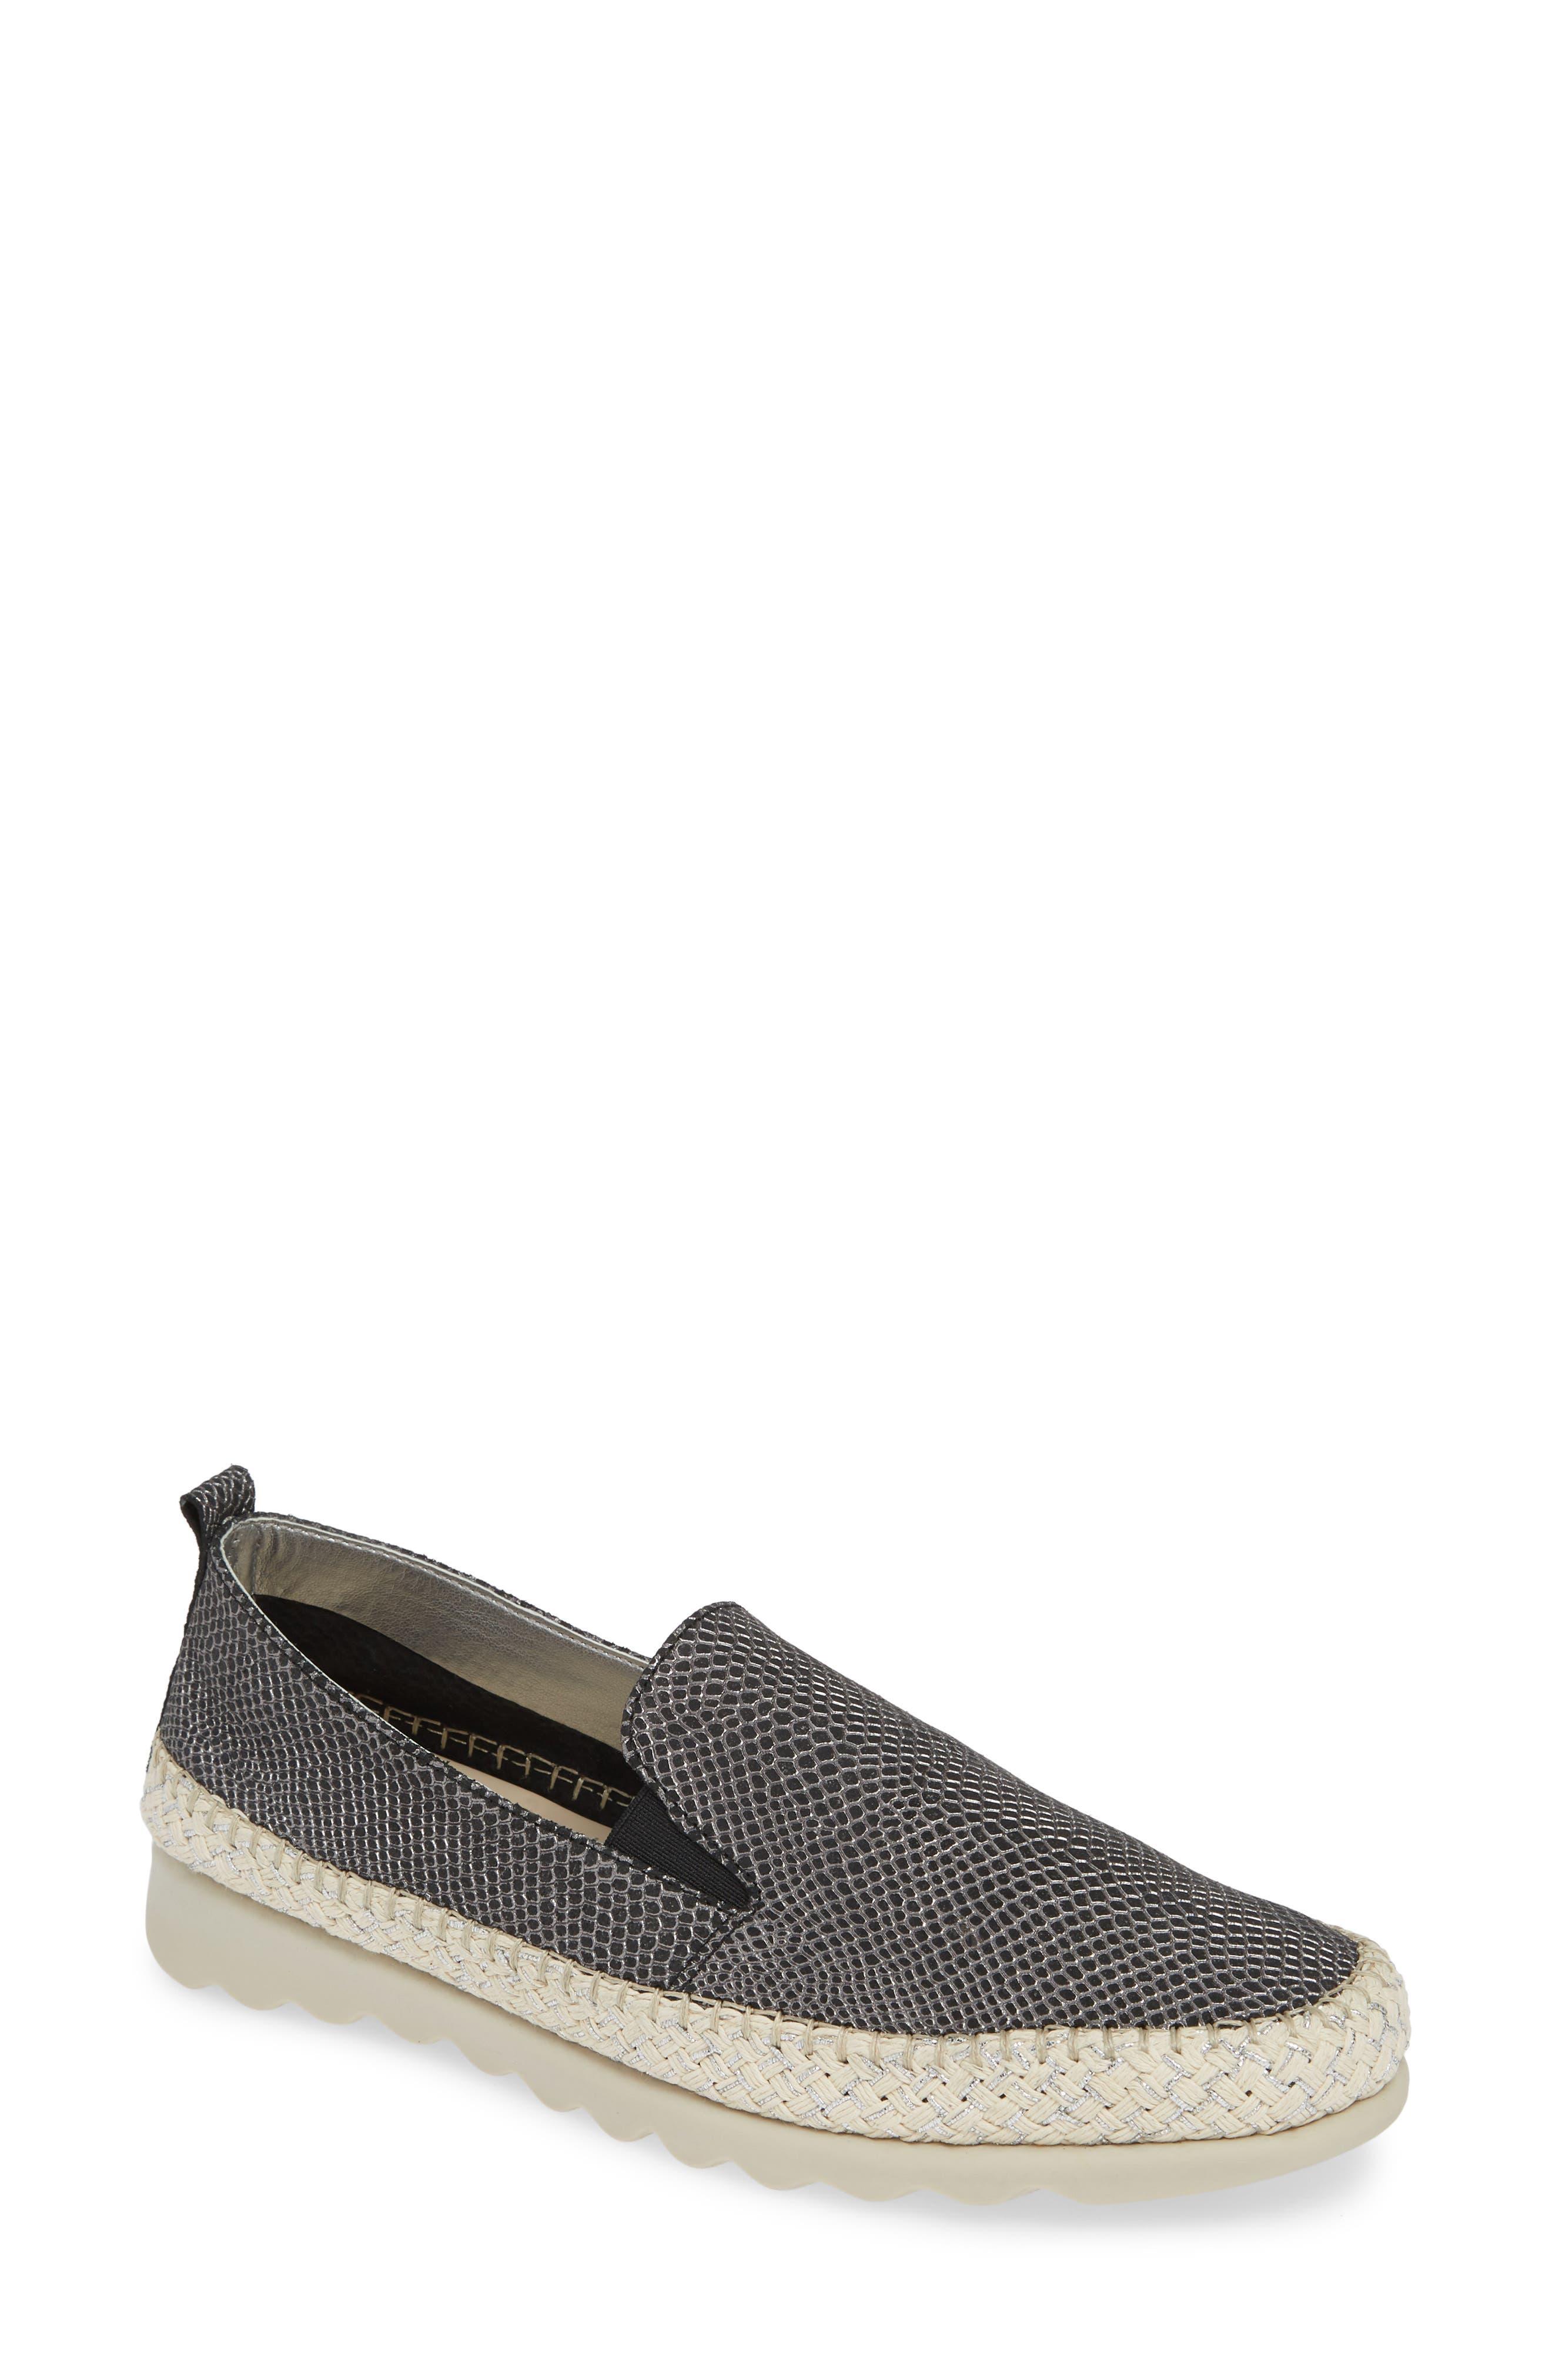 The Flexx Chappie Slip-On Sneaker- Black